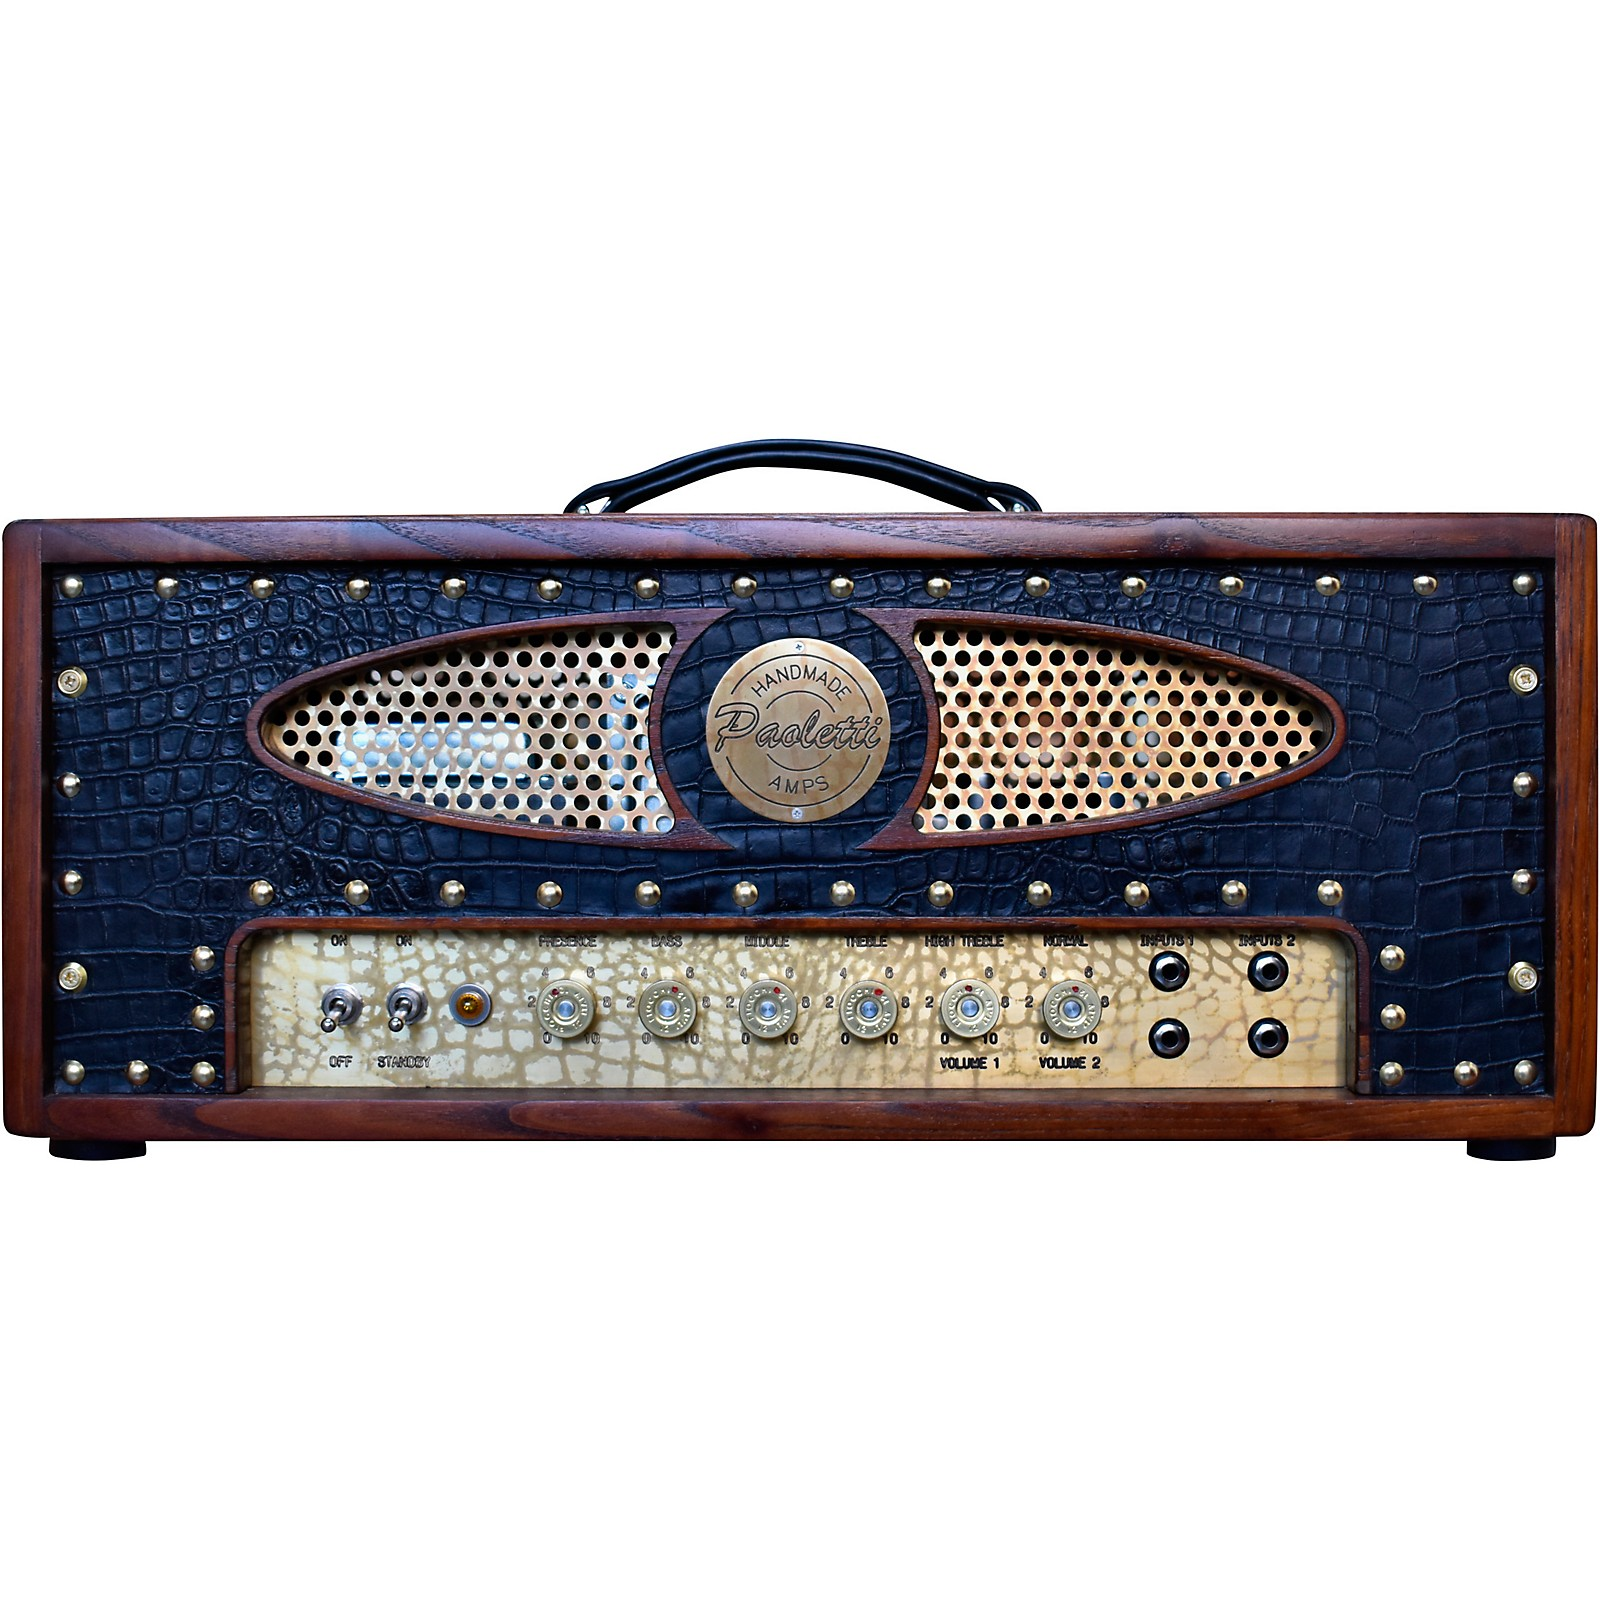 Paoletti Guitars Brutale 45W Tube Guitar Amp Head